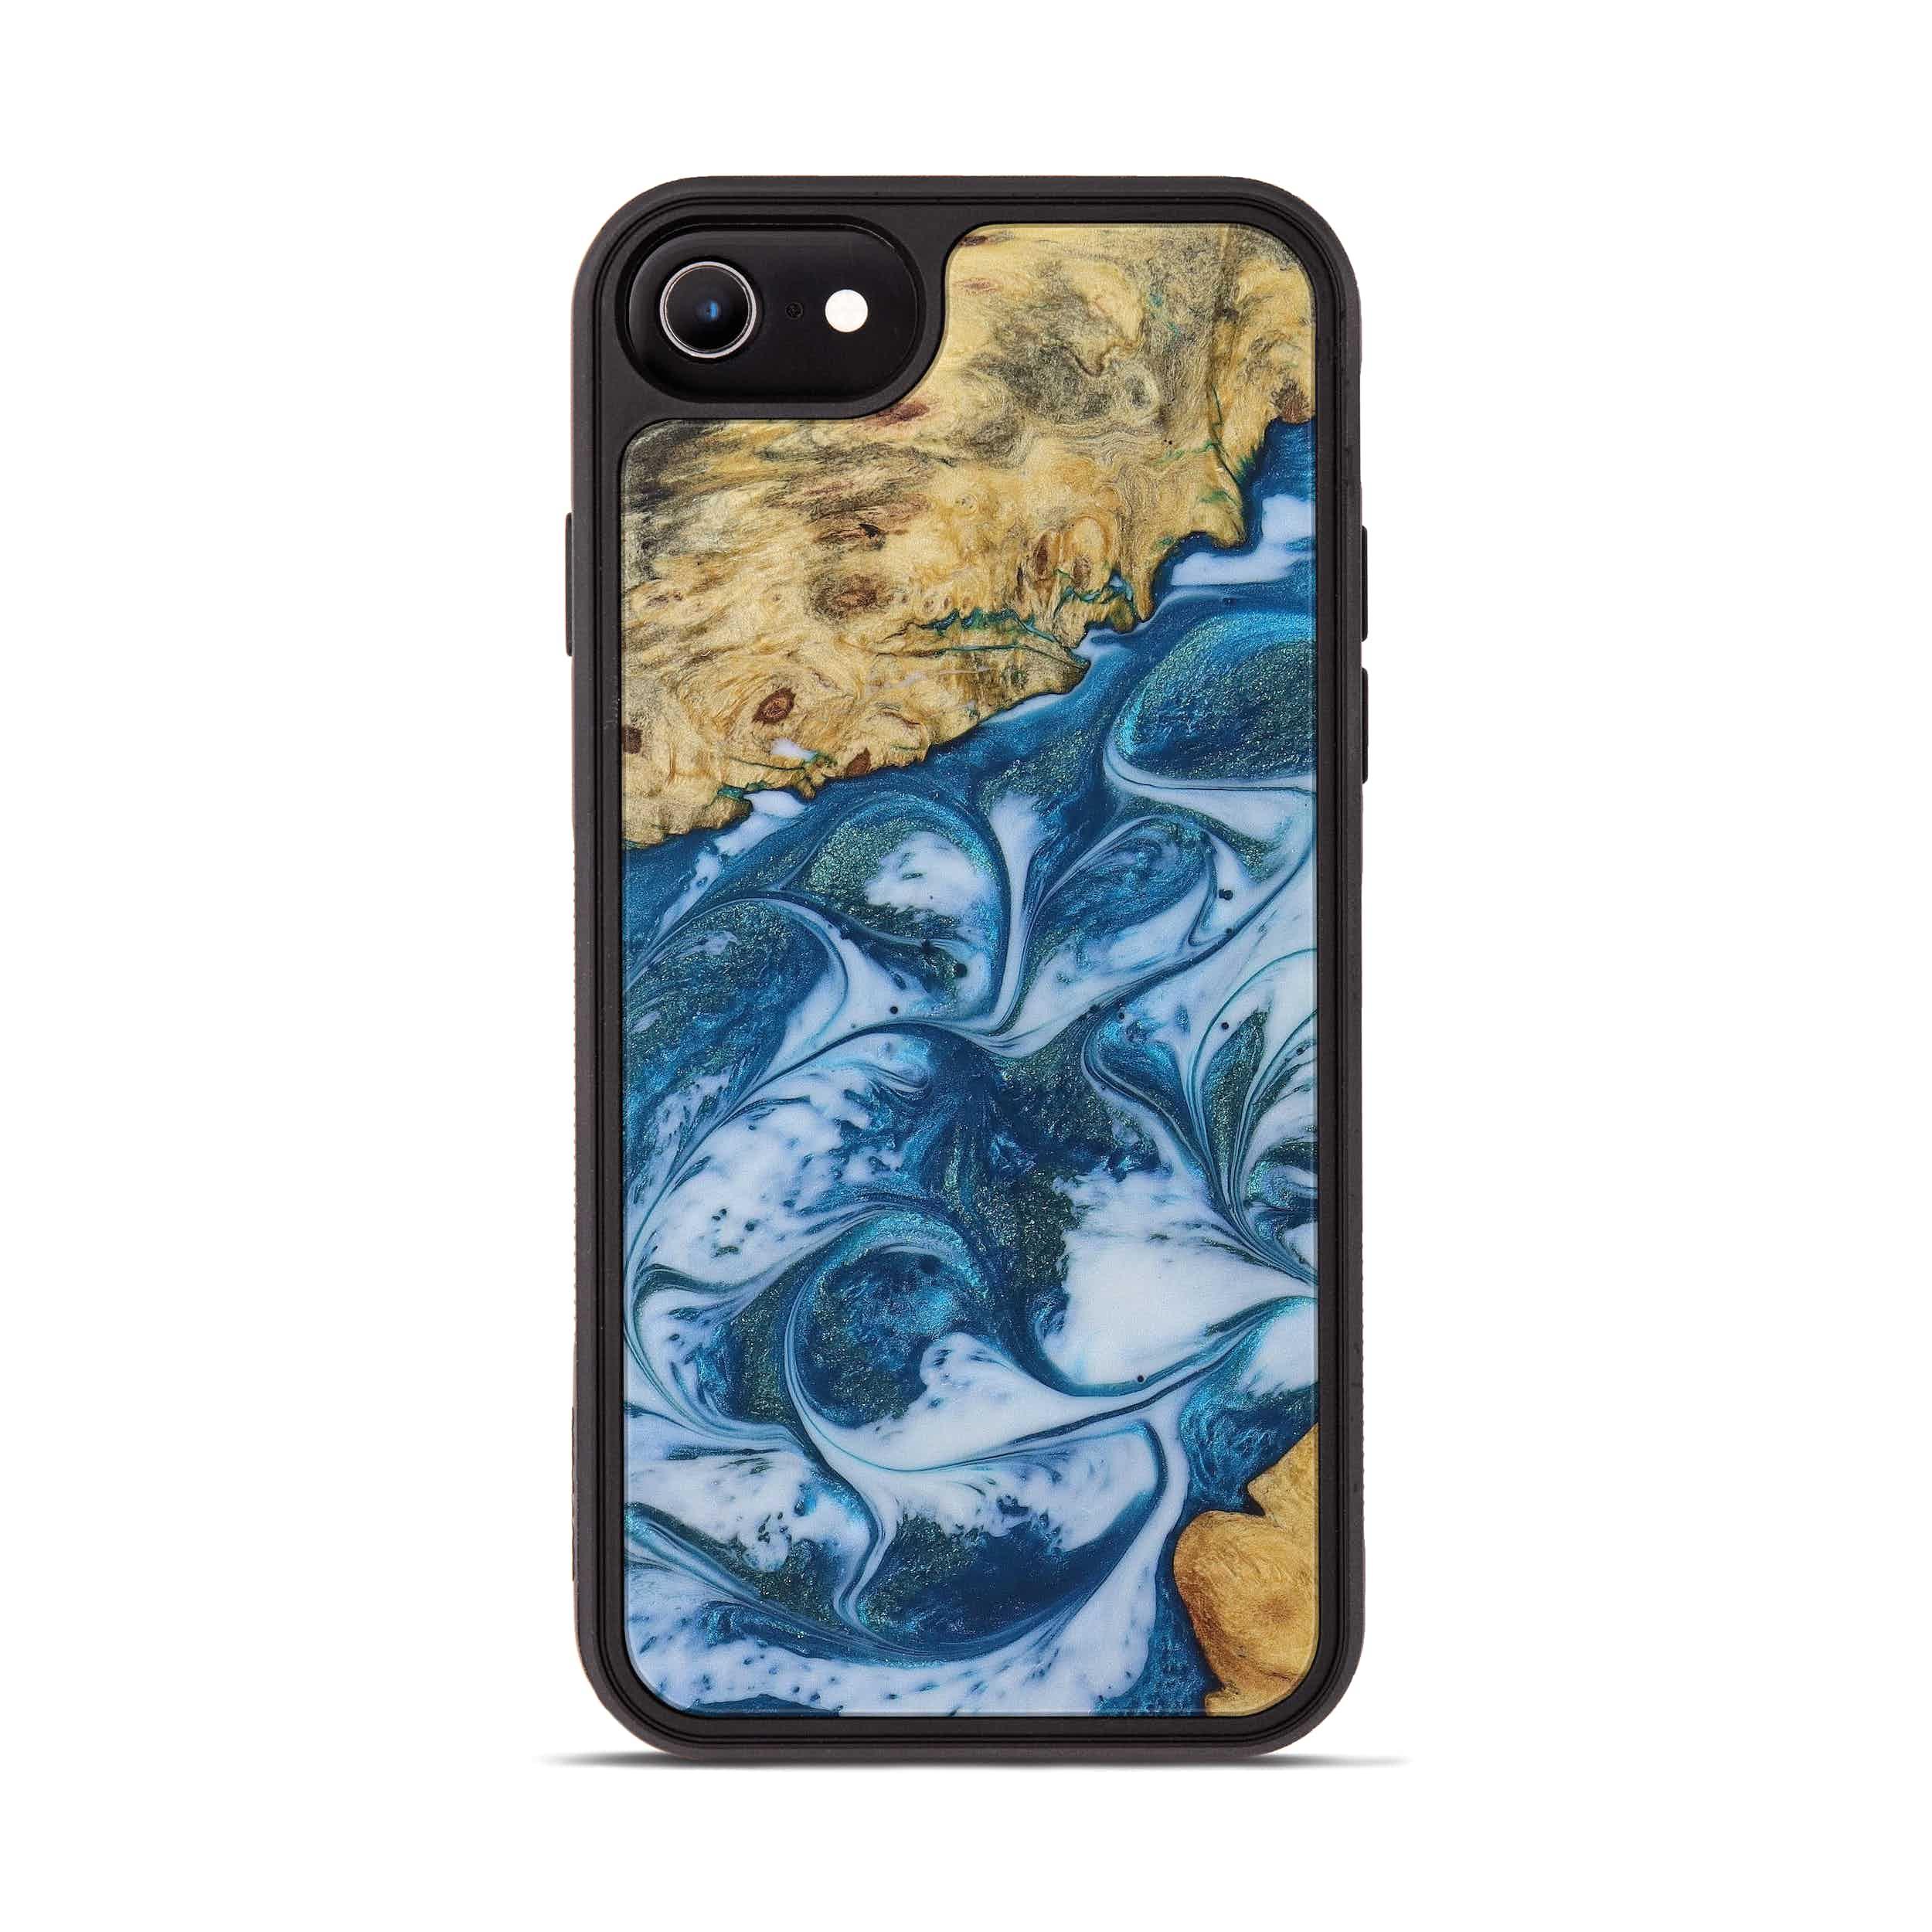 iPhone 8 Wood+Resin Phone Case - Sonya (Light Blue, 394820)